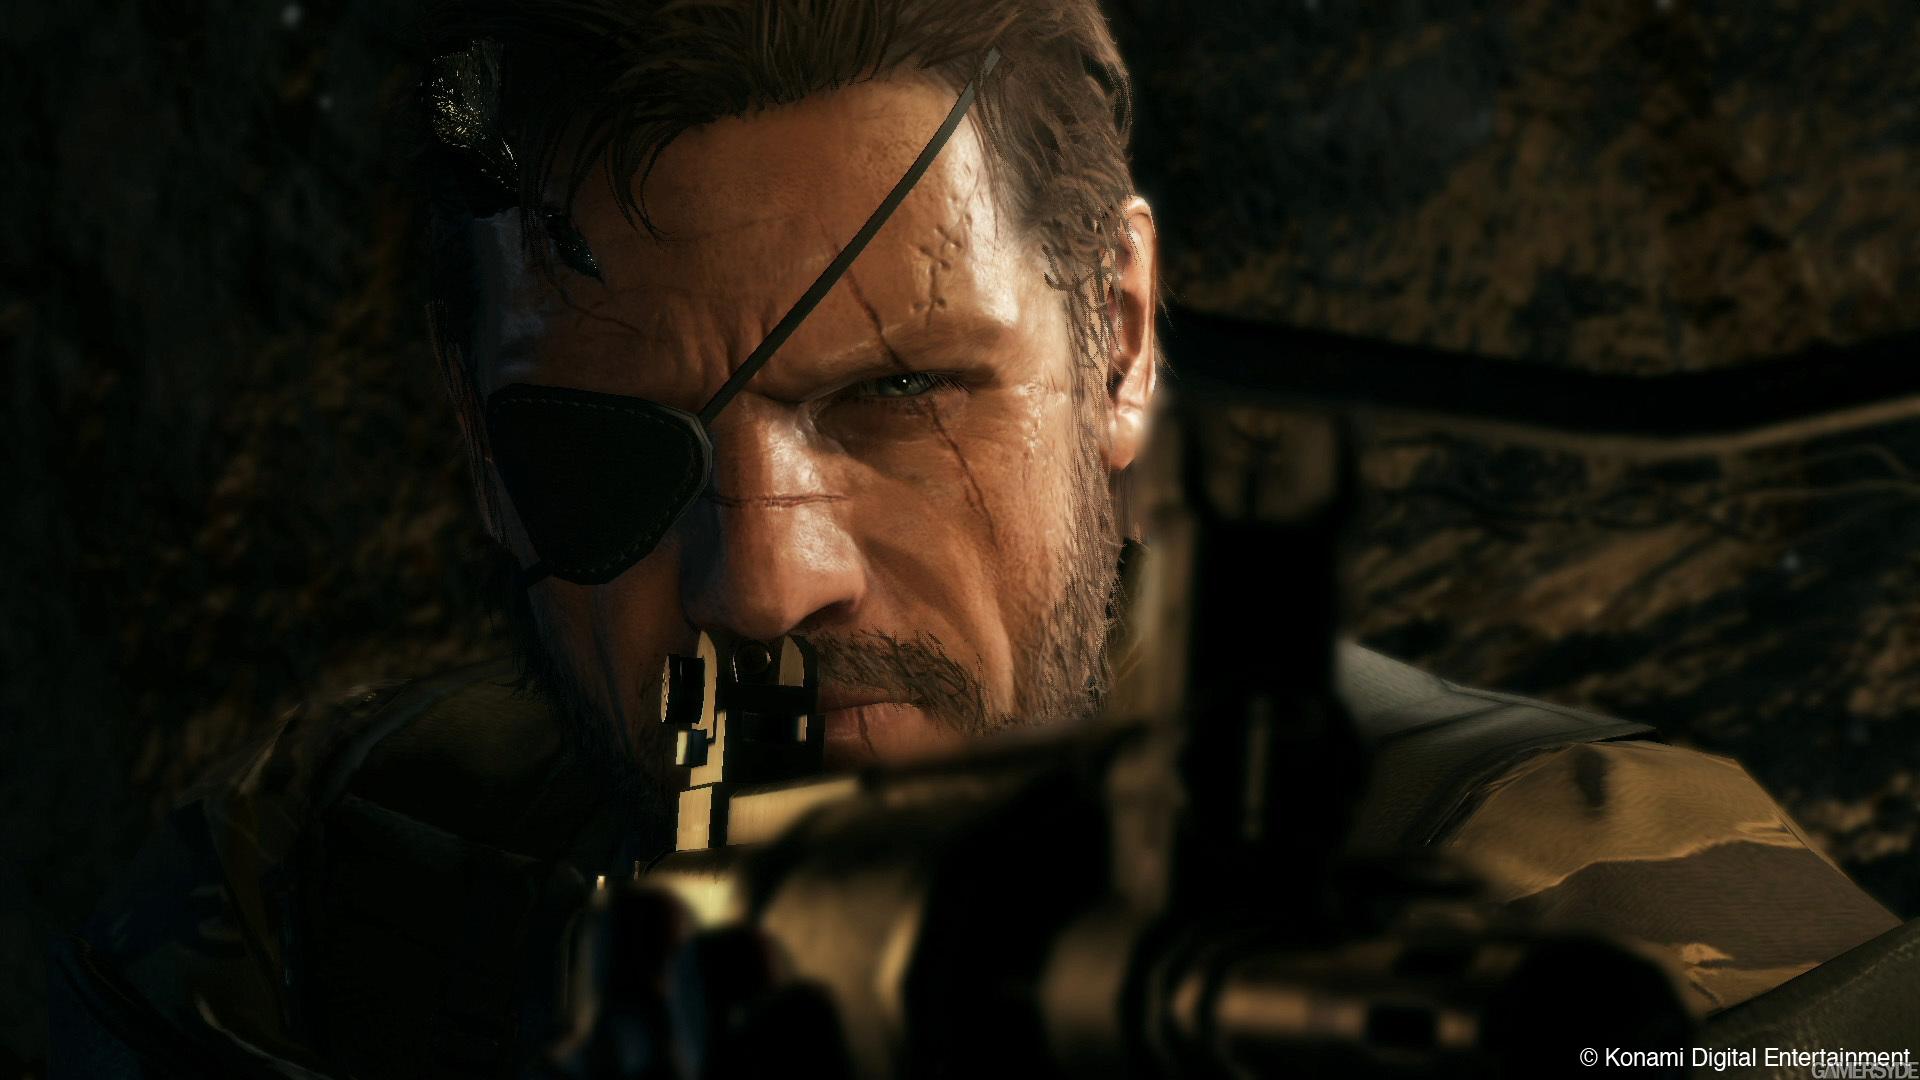 image metal gear solid v the phantom pain 22381 2584 0001 بازگشت پر سر و صدای مار بی صدا ! | تحلیل و بررسی نمایش Metal Gear Solid V : The Phantom Pain در نمایشگاه E3 2013